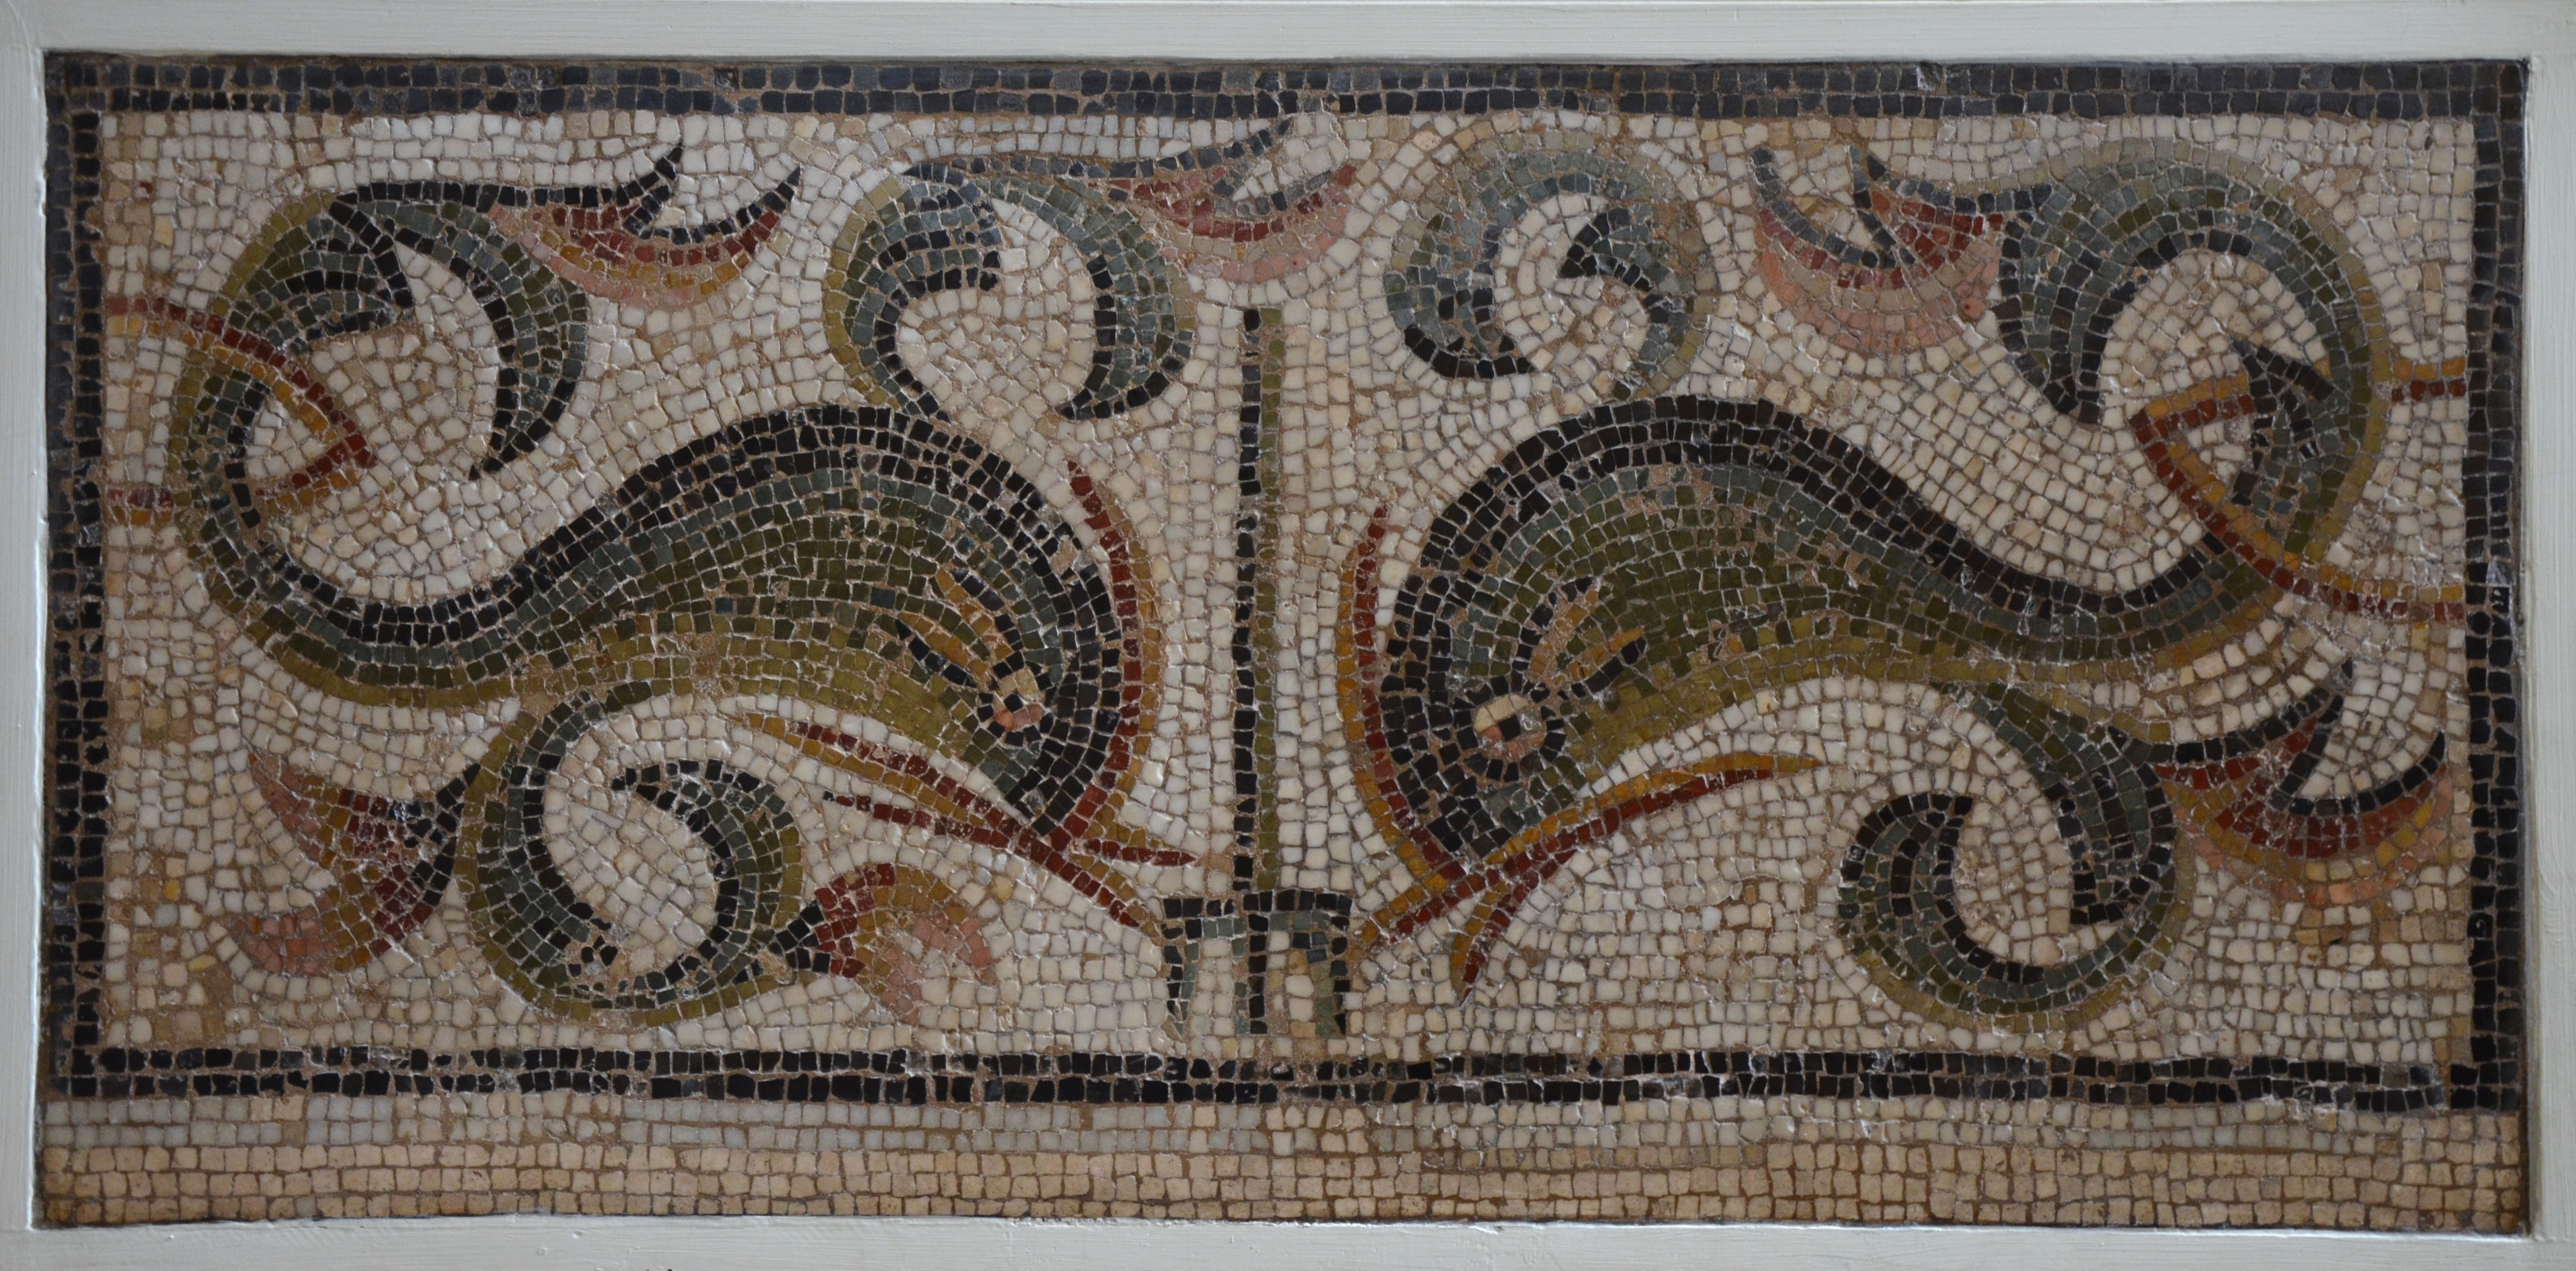 British Museum Mosaics File:mosaic British Museum